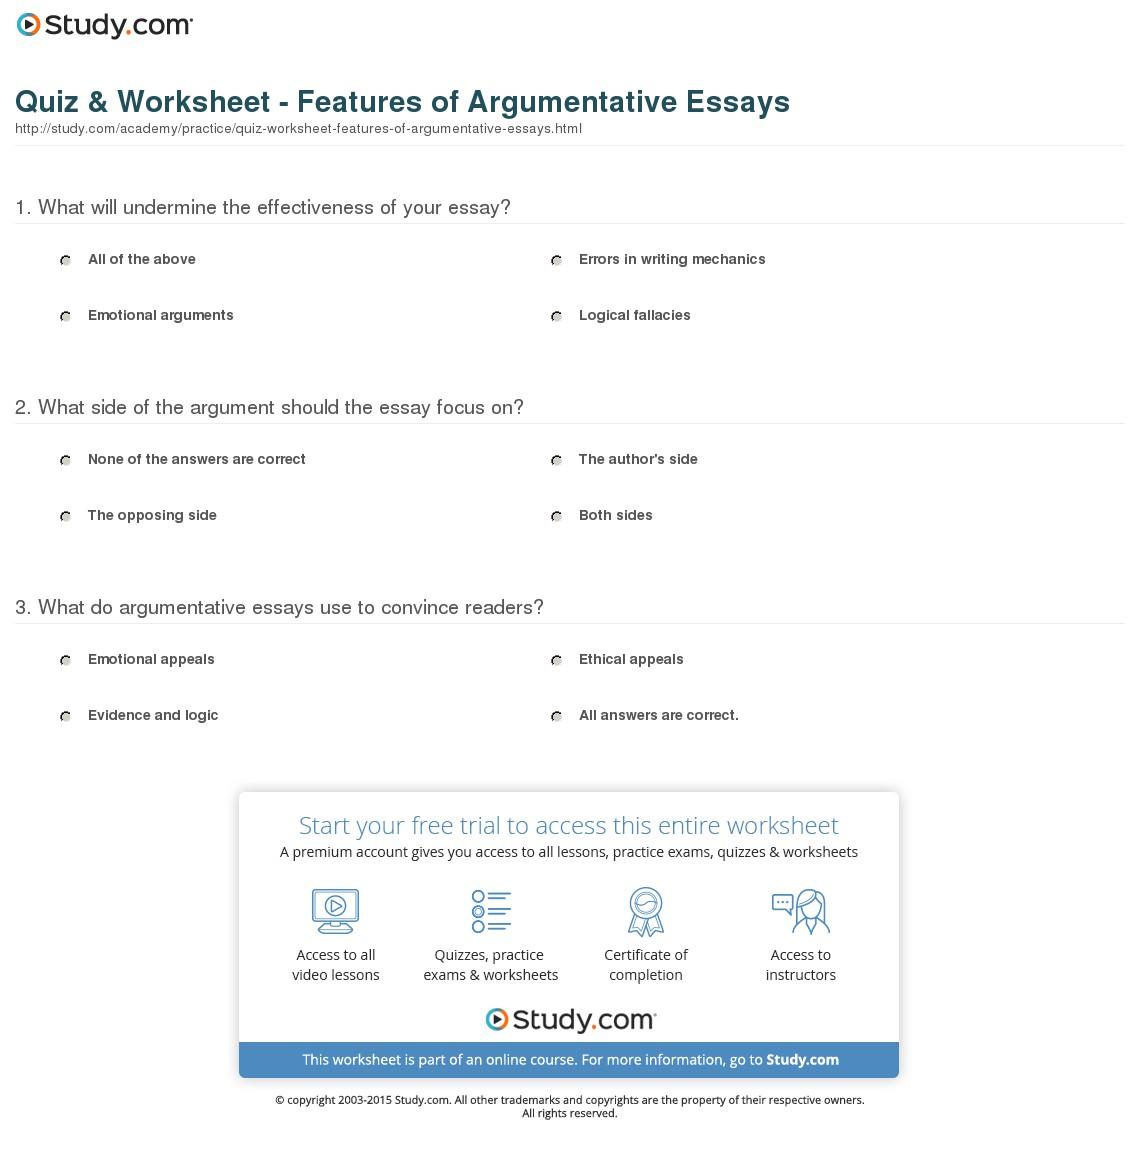 013 Argumentative Essay Structure Quiz Worksheet Features Of Essays Imposing Ppt Pdf Outline Full